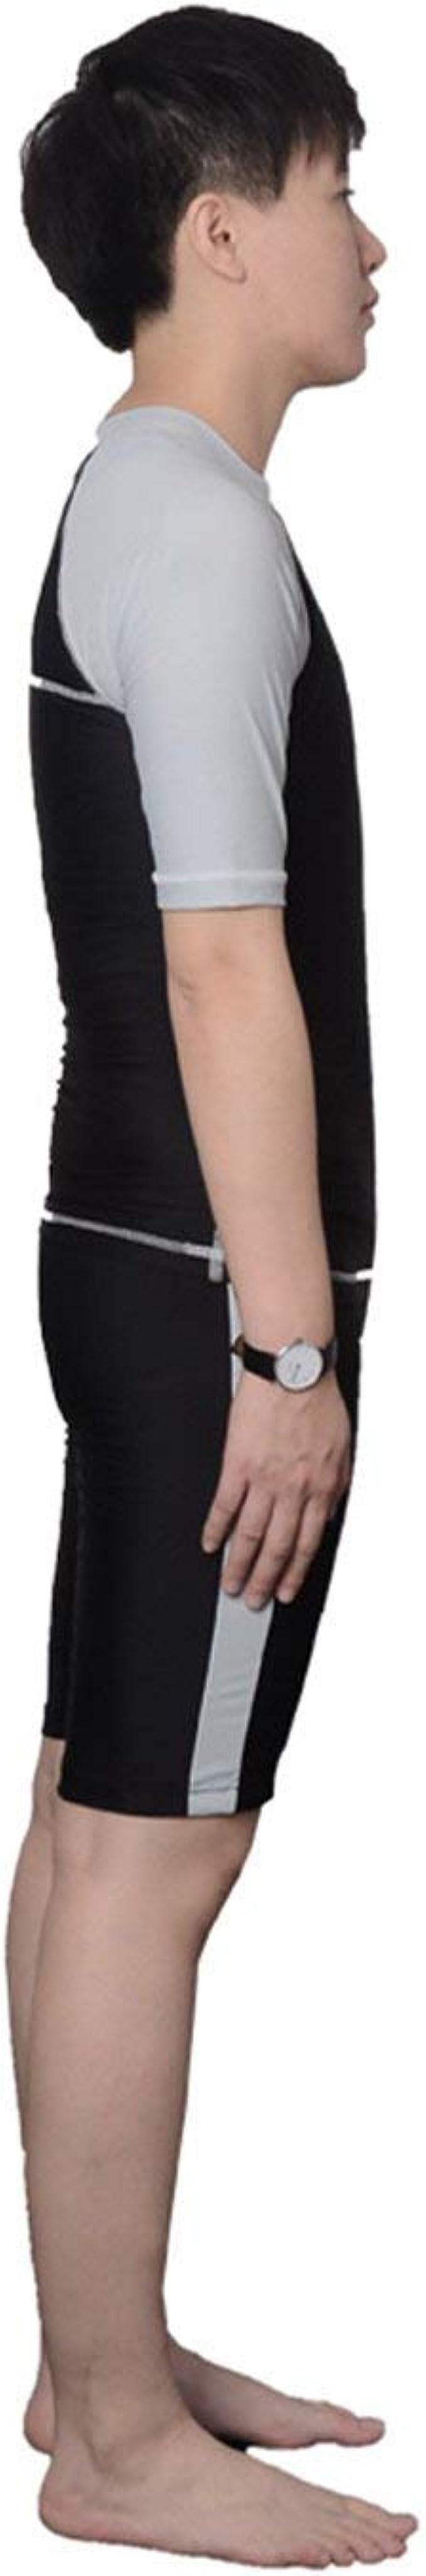 BaronHong Women Lesbian Tomboy Chest Binder Quick-Drying Swimwear Set Top+Swimming Pants 39853963379-swimwear